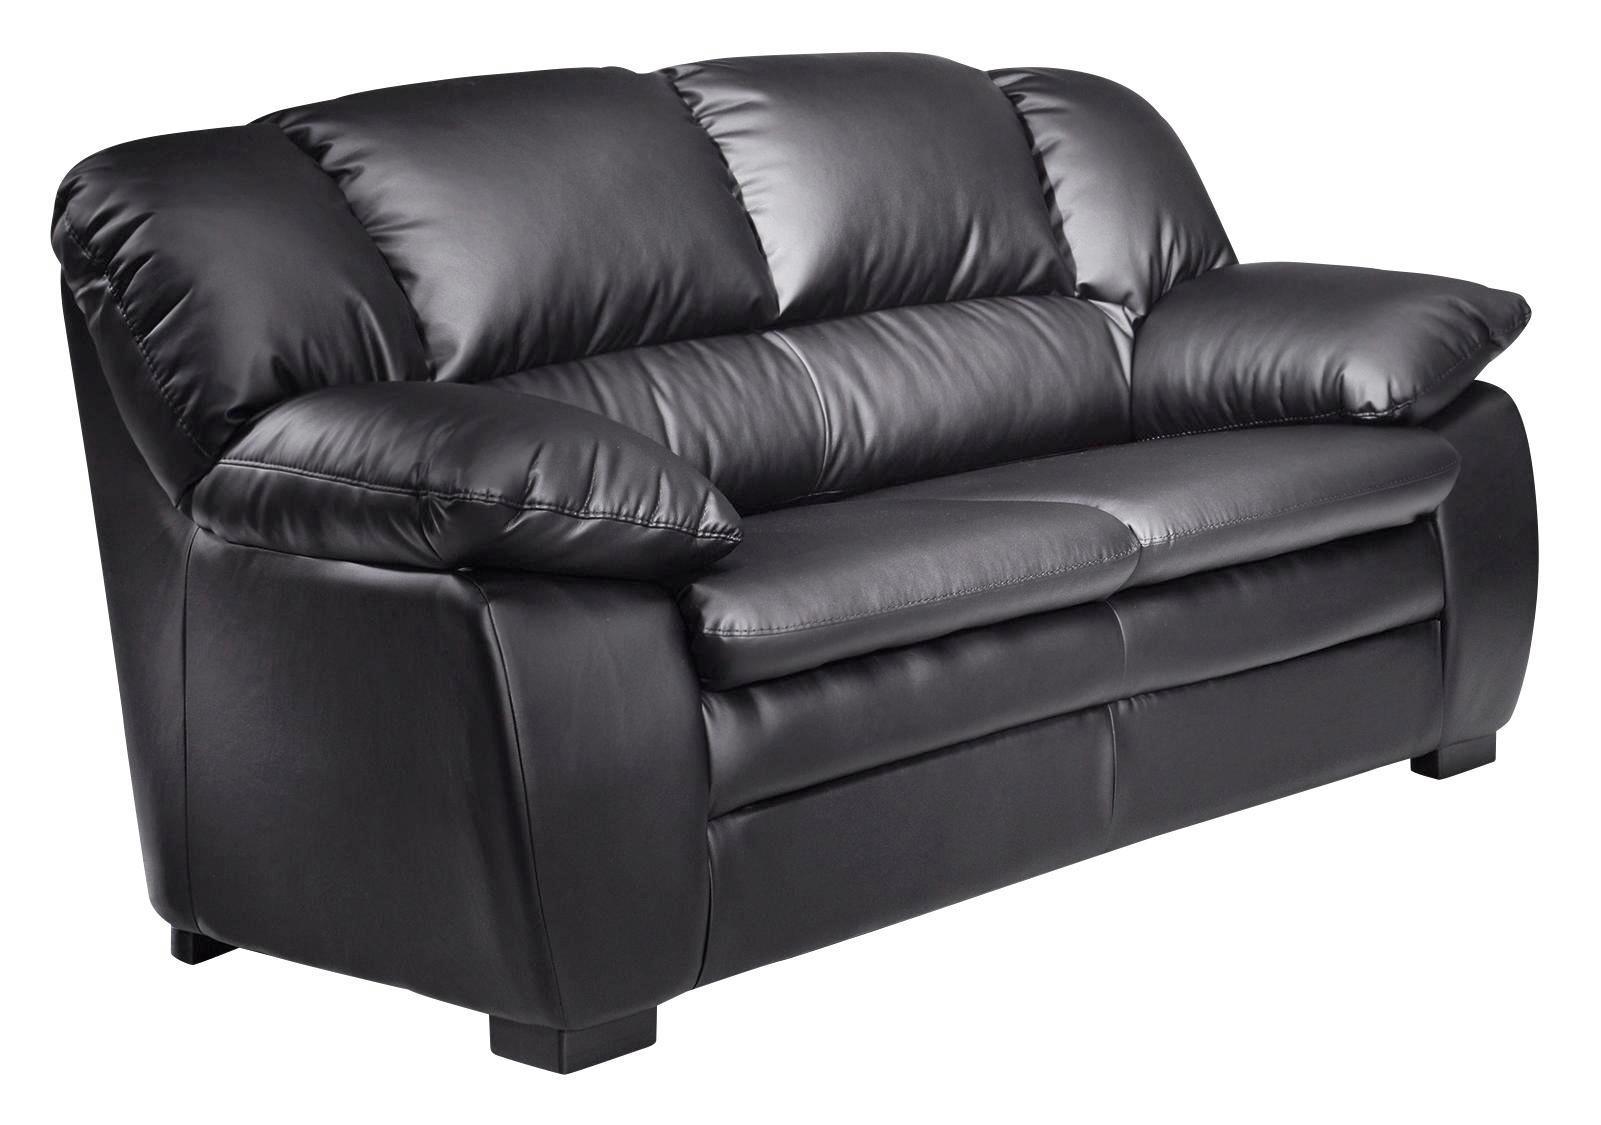 Bezaubernd Zweisitzer Sofa Foto Von Schwarz - Maak Het U Gemakkelijk Om